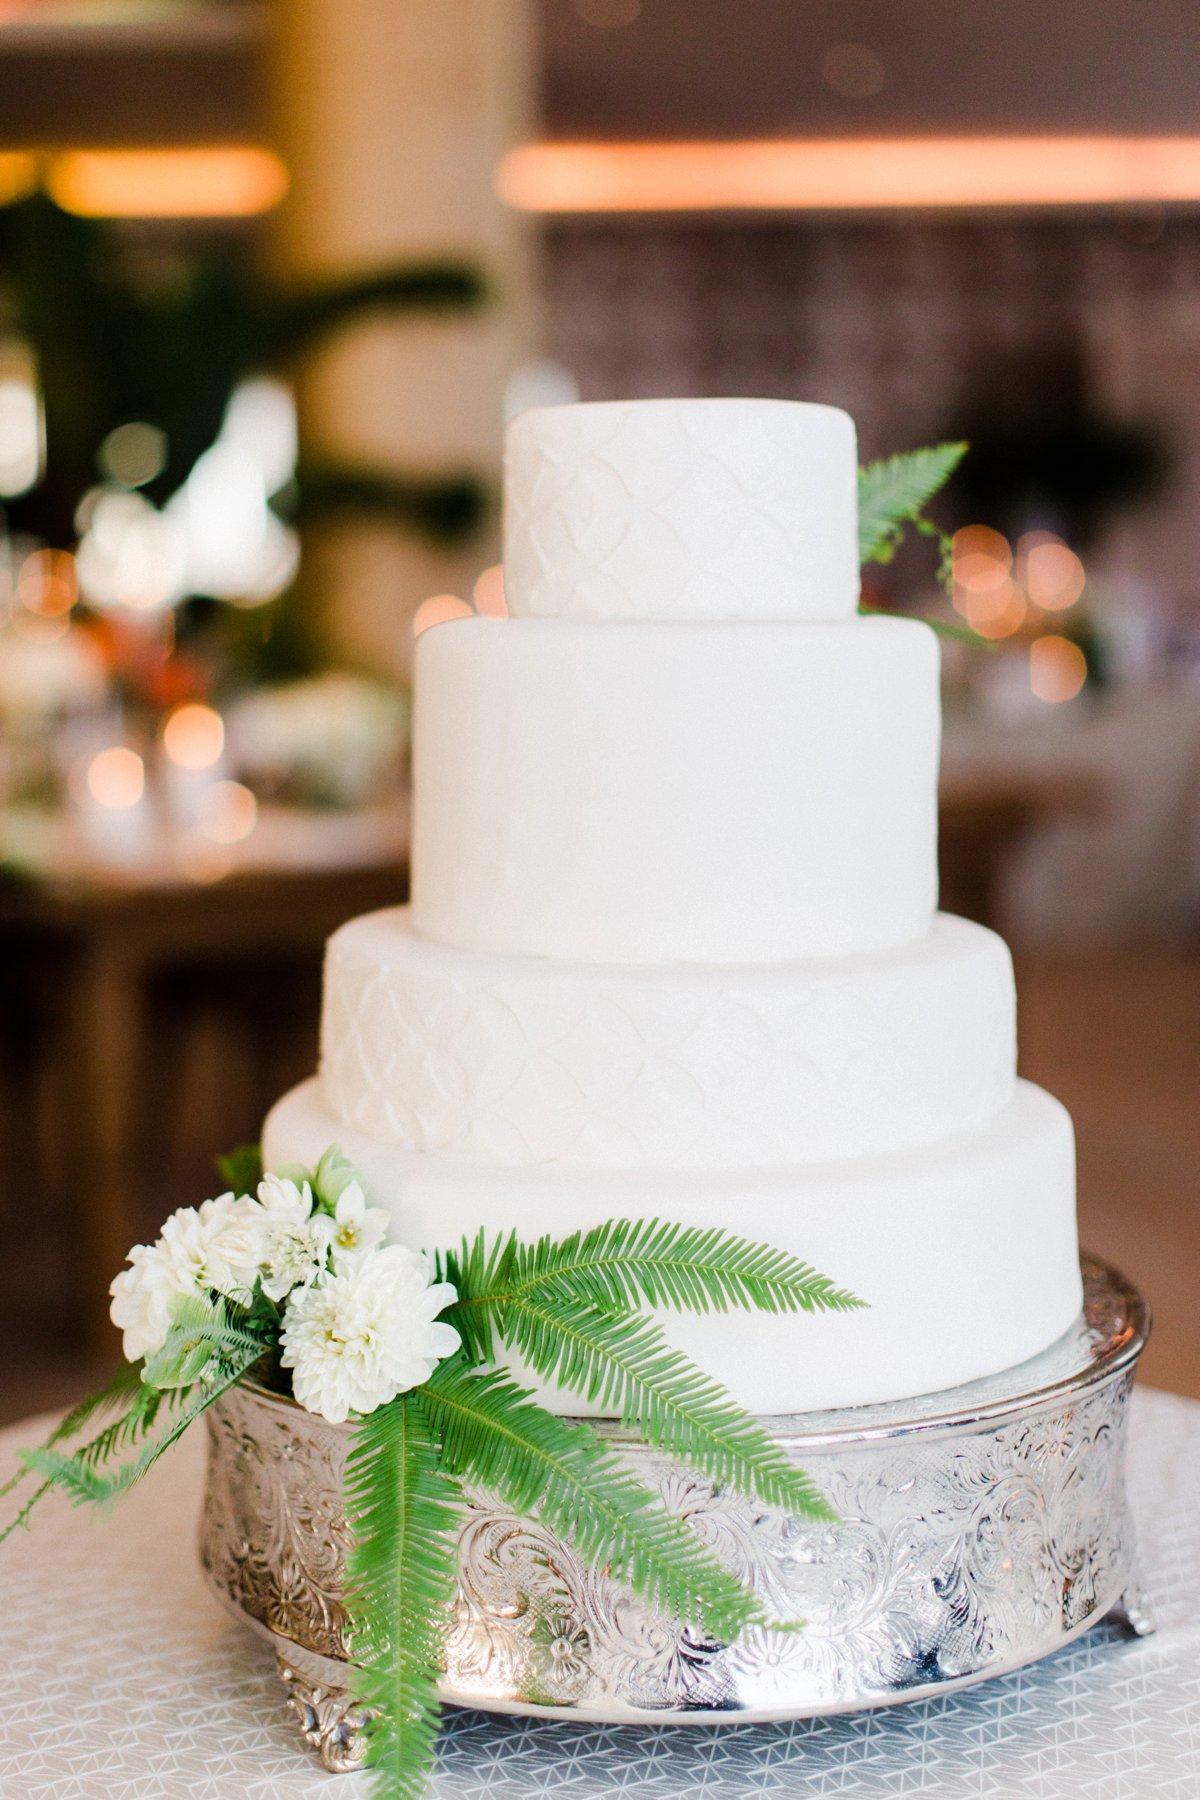 modern white wedding cakes - photo by Anna Delores http://ruffledblog.com/chic-modern-wedding-at-four-seasons-santa-barbara